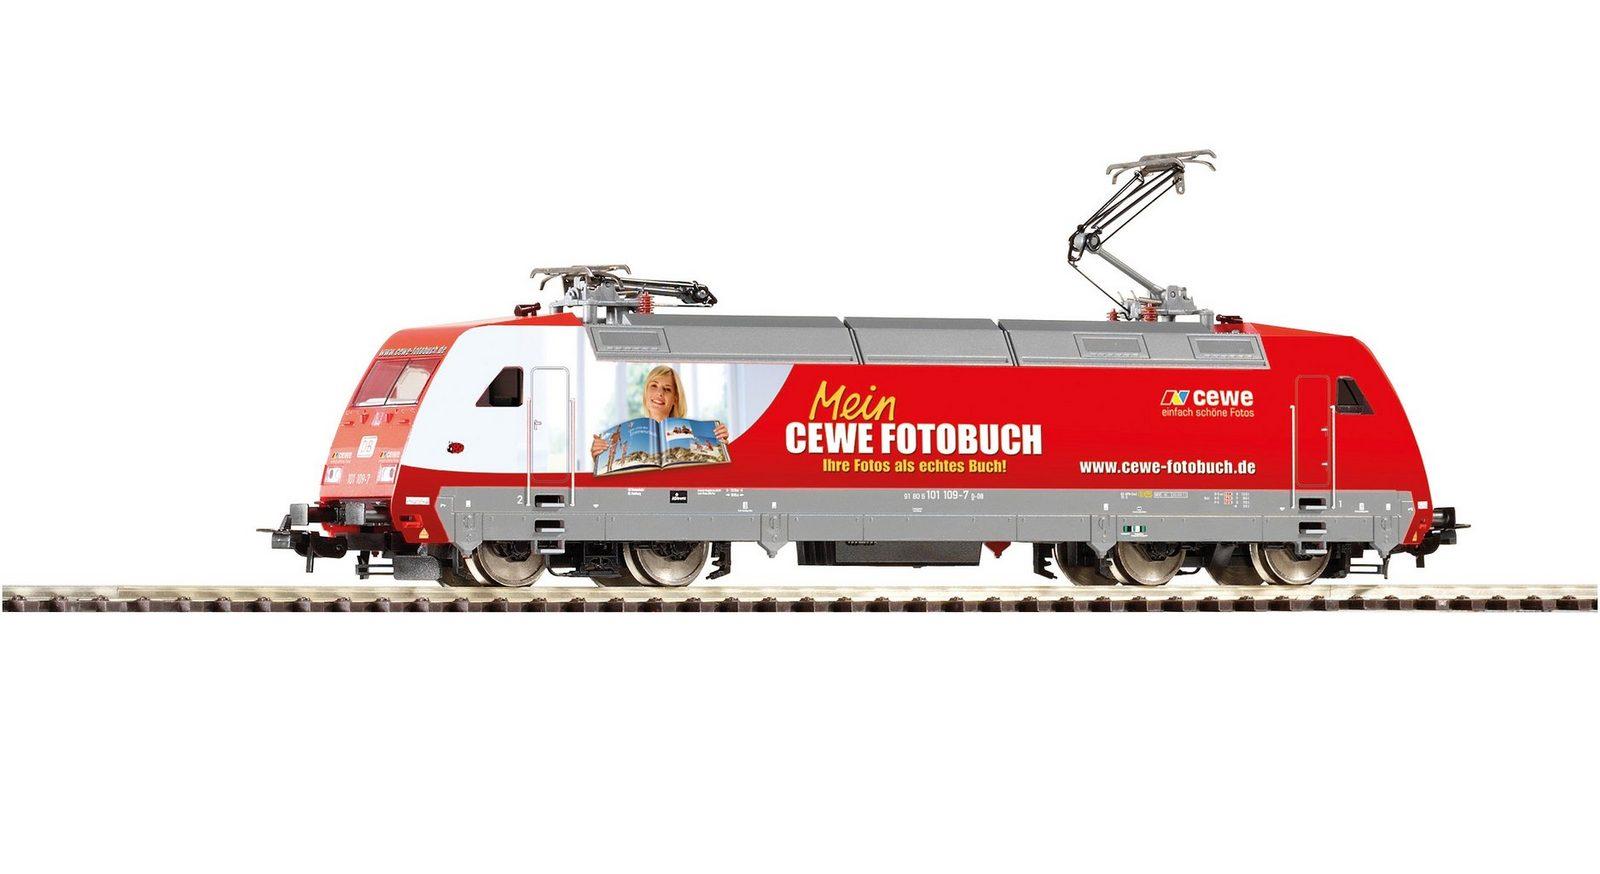 PIKO E-Lok, »E-Lok BR 101 CEWE, DB AG - Wechselstrom« Spur H0 - broschei